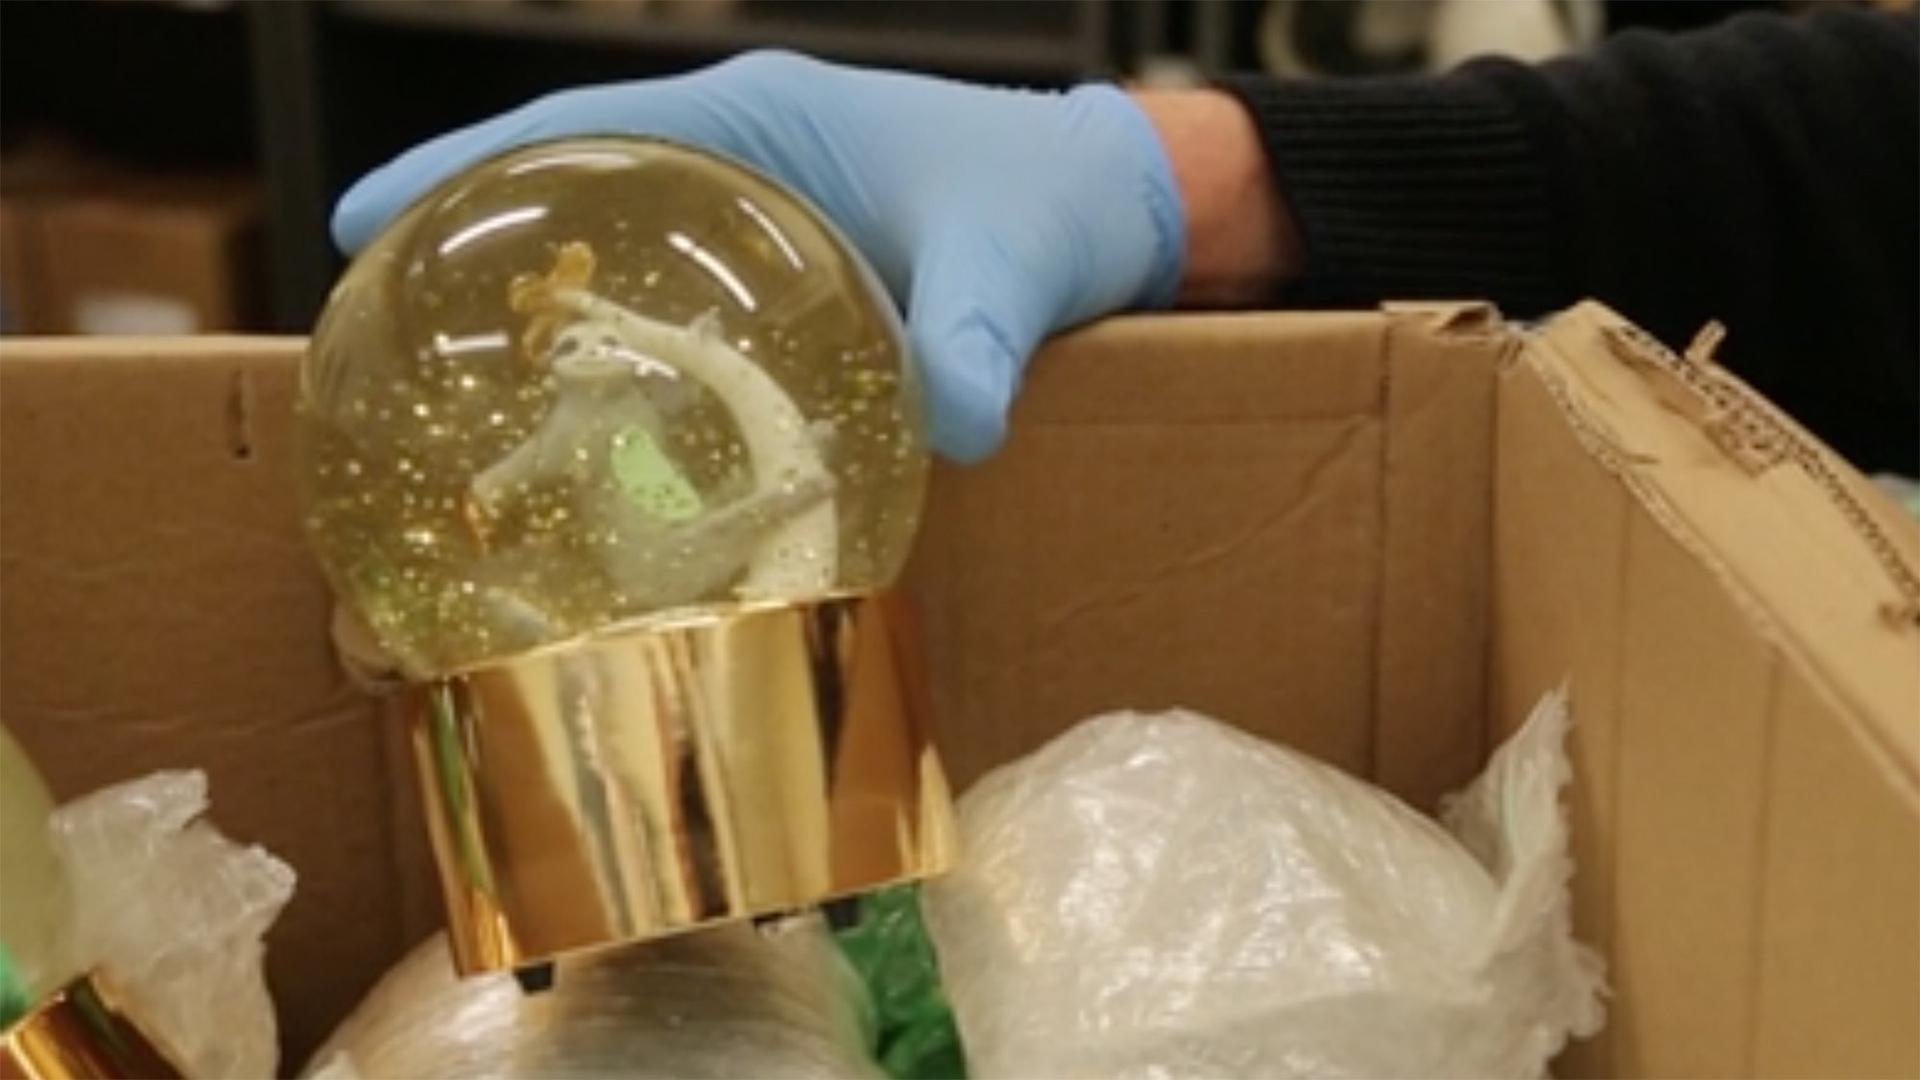 The liquid methamphetamine totaled more than 7 liters, officials said. (Credit: Australian Border Force)